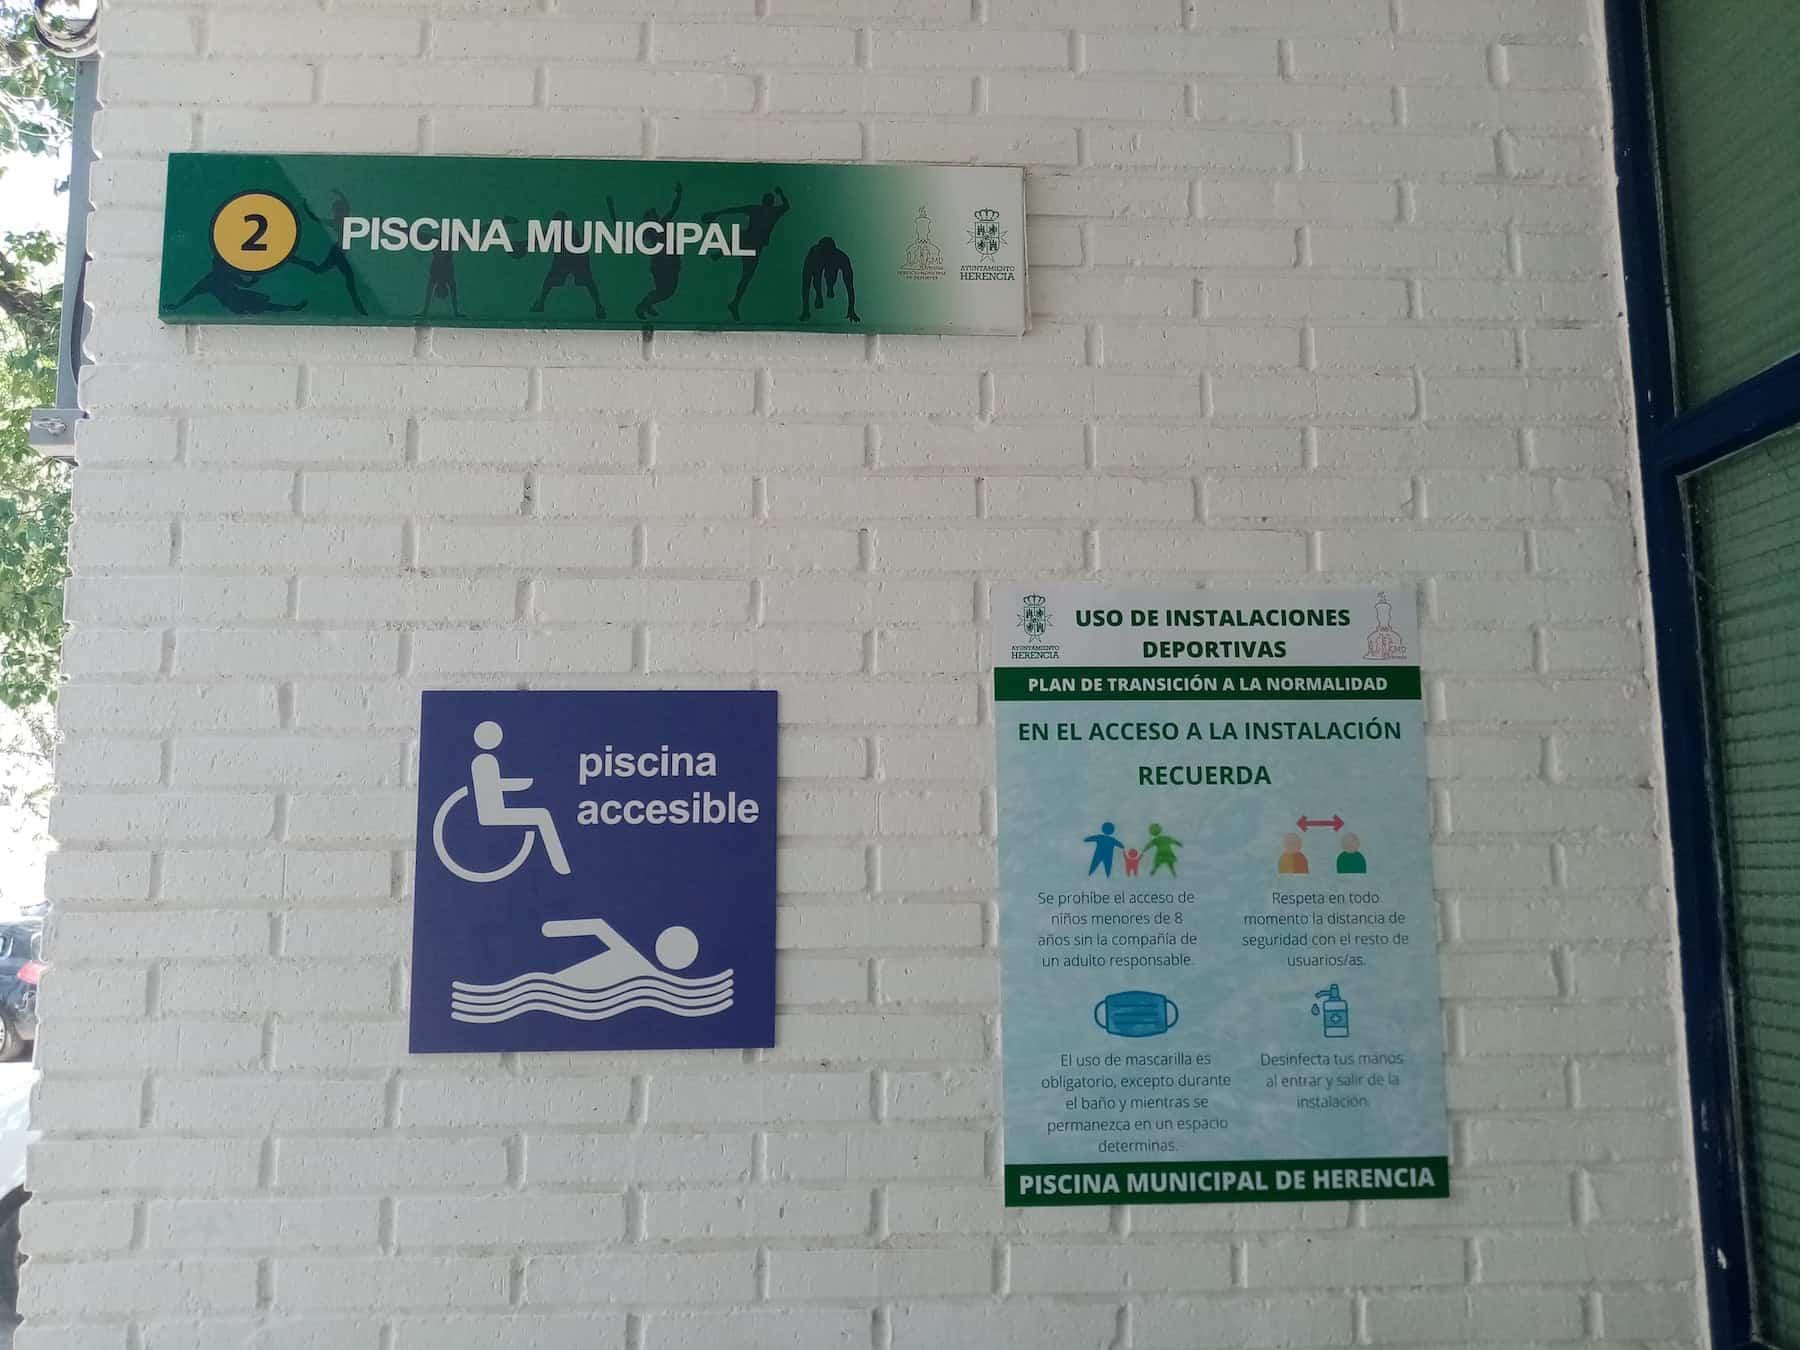 La Piscina Municipal de Herencia abre como un espacio 100% accesible 5